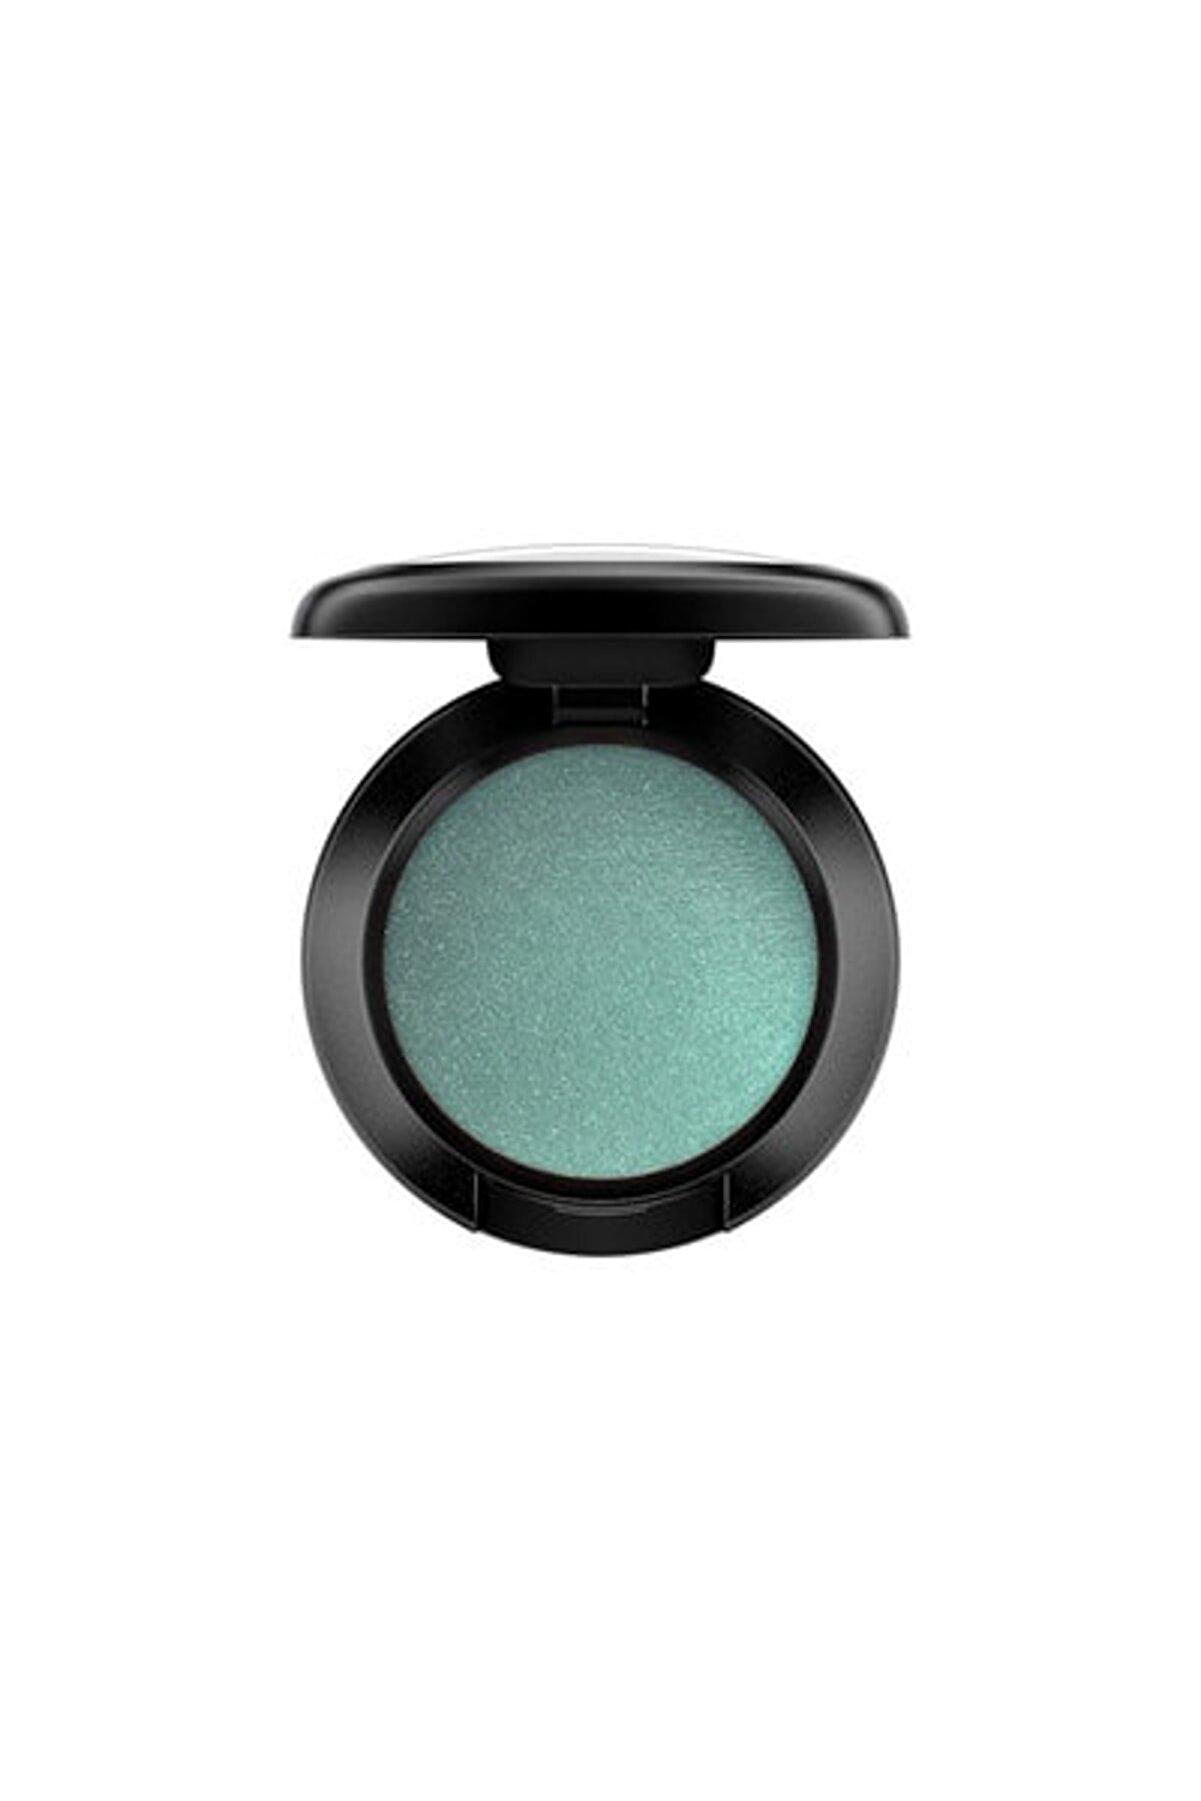 Mac Göz Farı - Eye Shadow Steamy Frost 773602017959